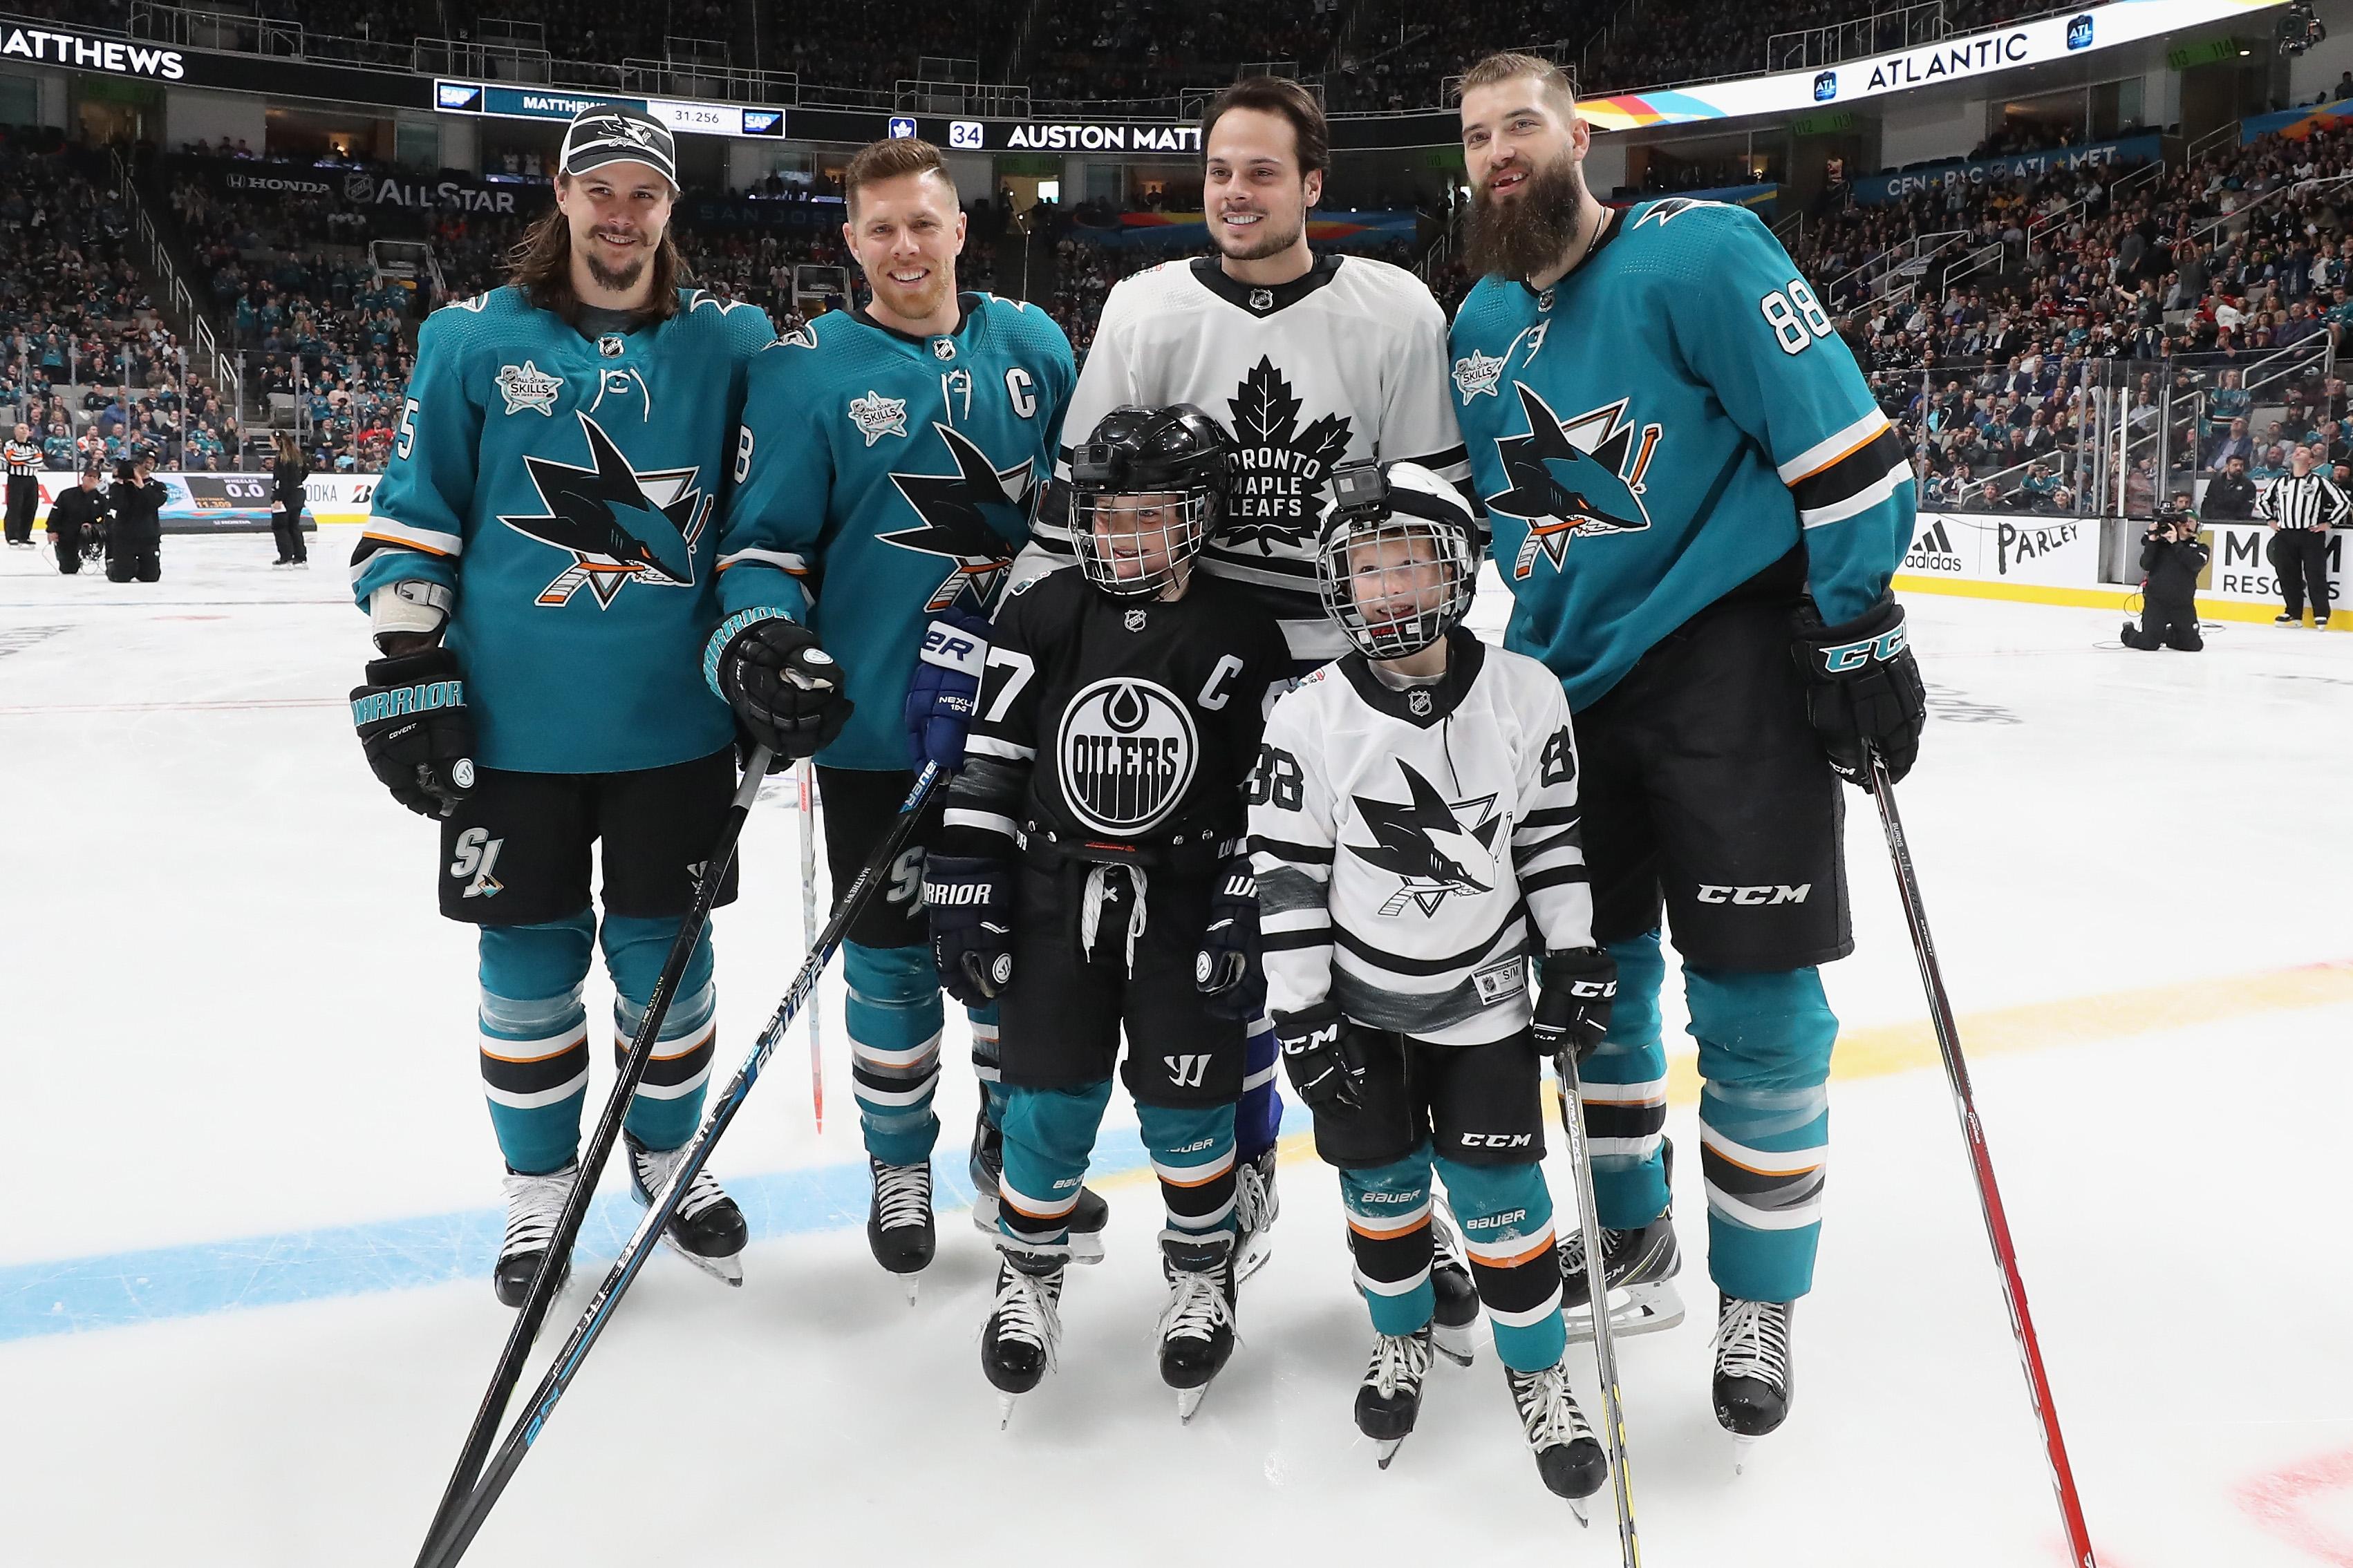 SAN JOSE, CA - JANUARY 25: Erik Karlsson #65, Joe Pavelski #8, and Brent Burns #88 of the San Jose Sharks pose with Auston Matthews #34 of the Toronto Maple Leafs during the Honda NHL Accuracy Shooting during the 2019 SAP NHL All-Star Skills at SAP Center